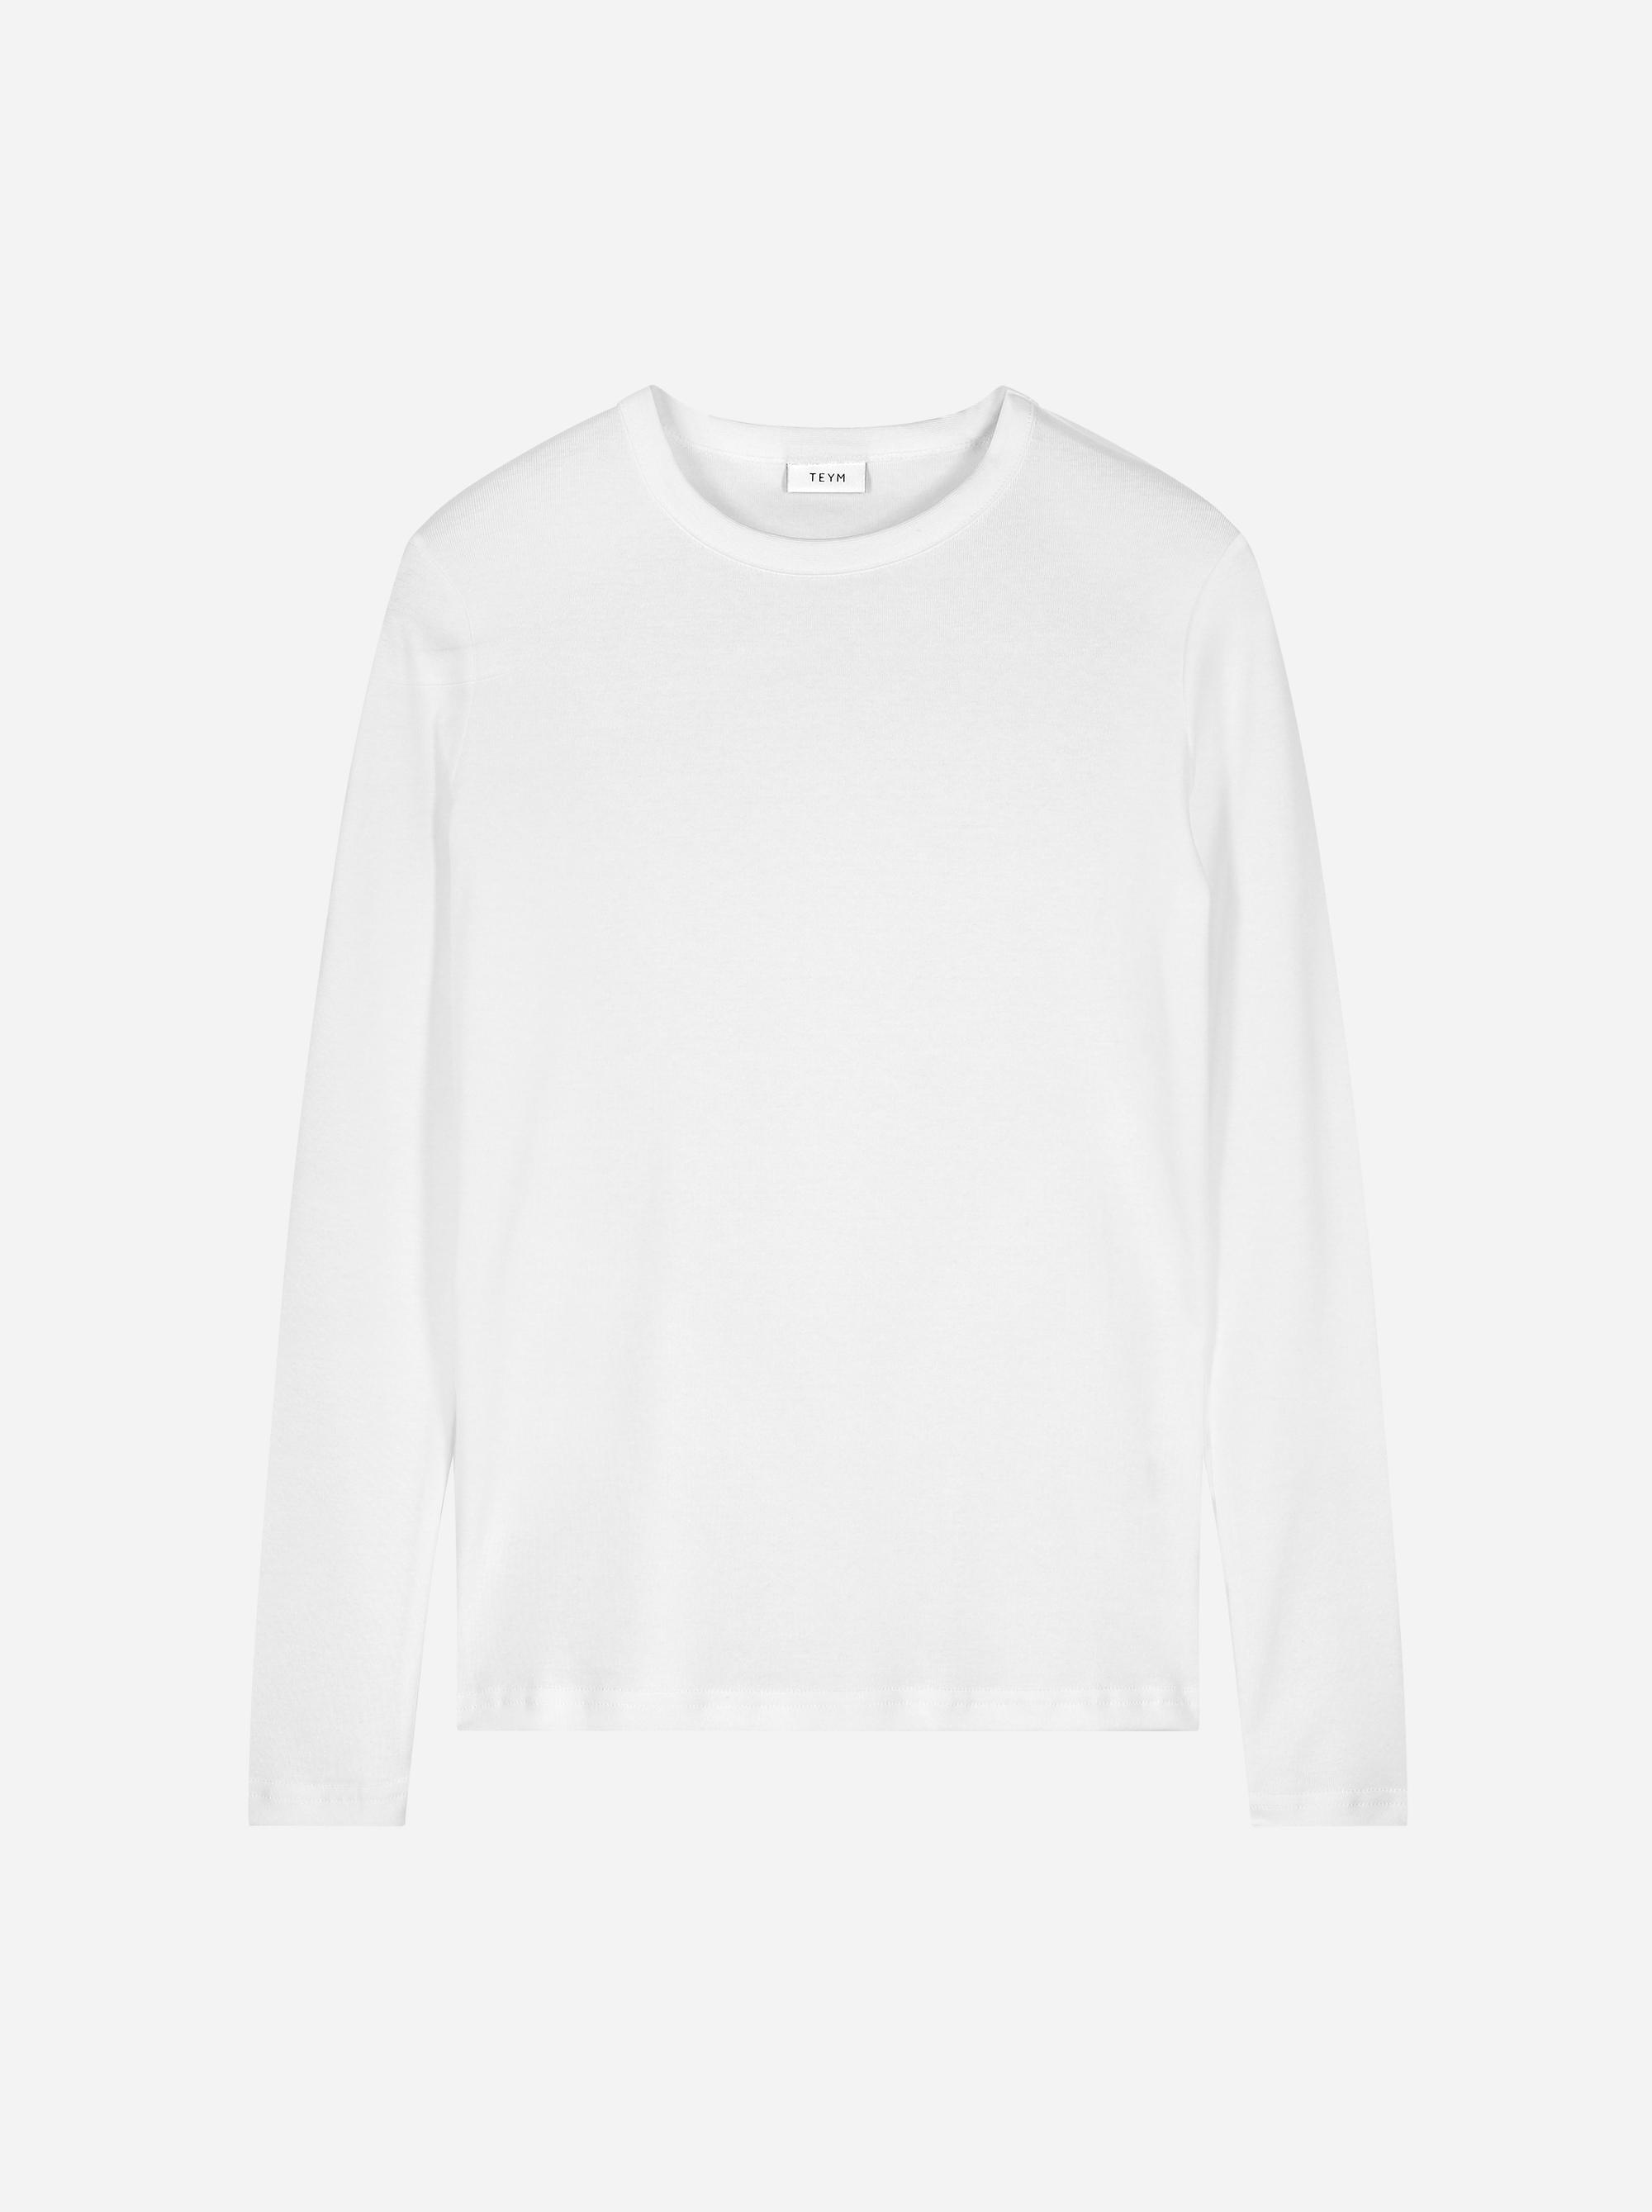 Teym_The Longsleeve T-Shirt_white_female_front_1B